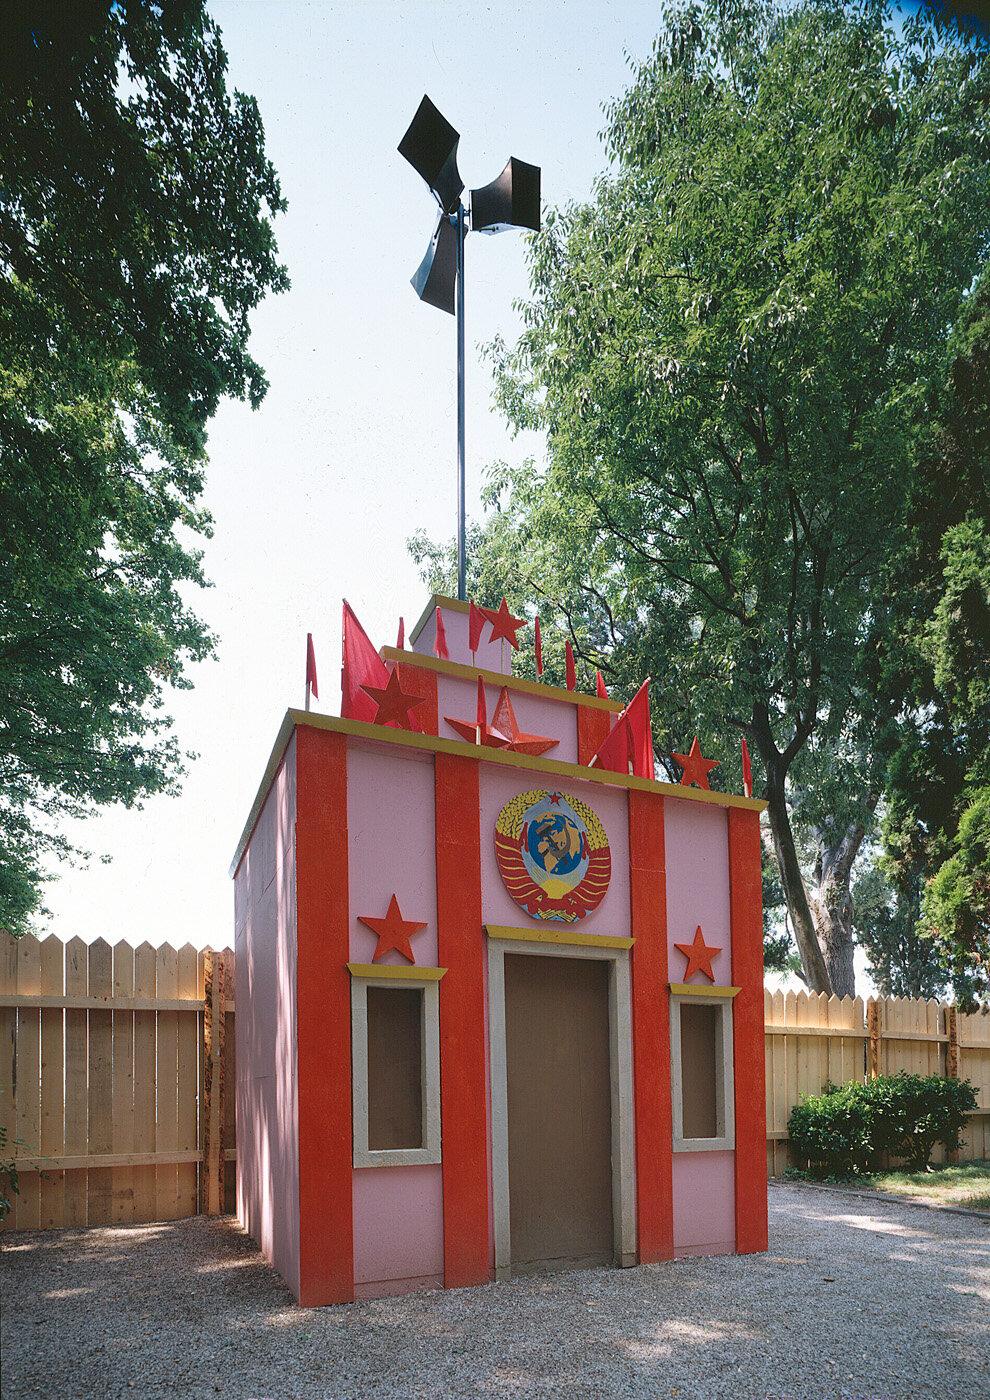 The-Red-Pavilion-6.jpg